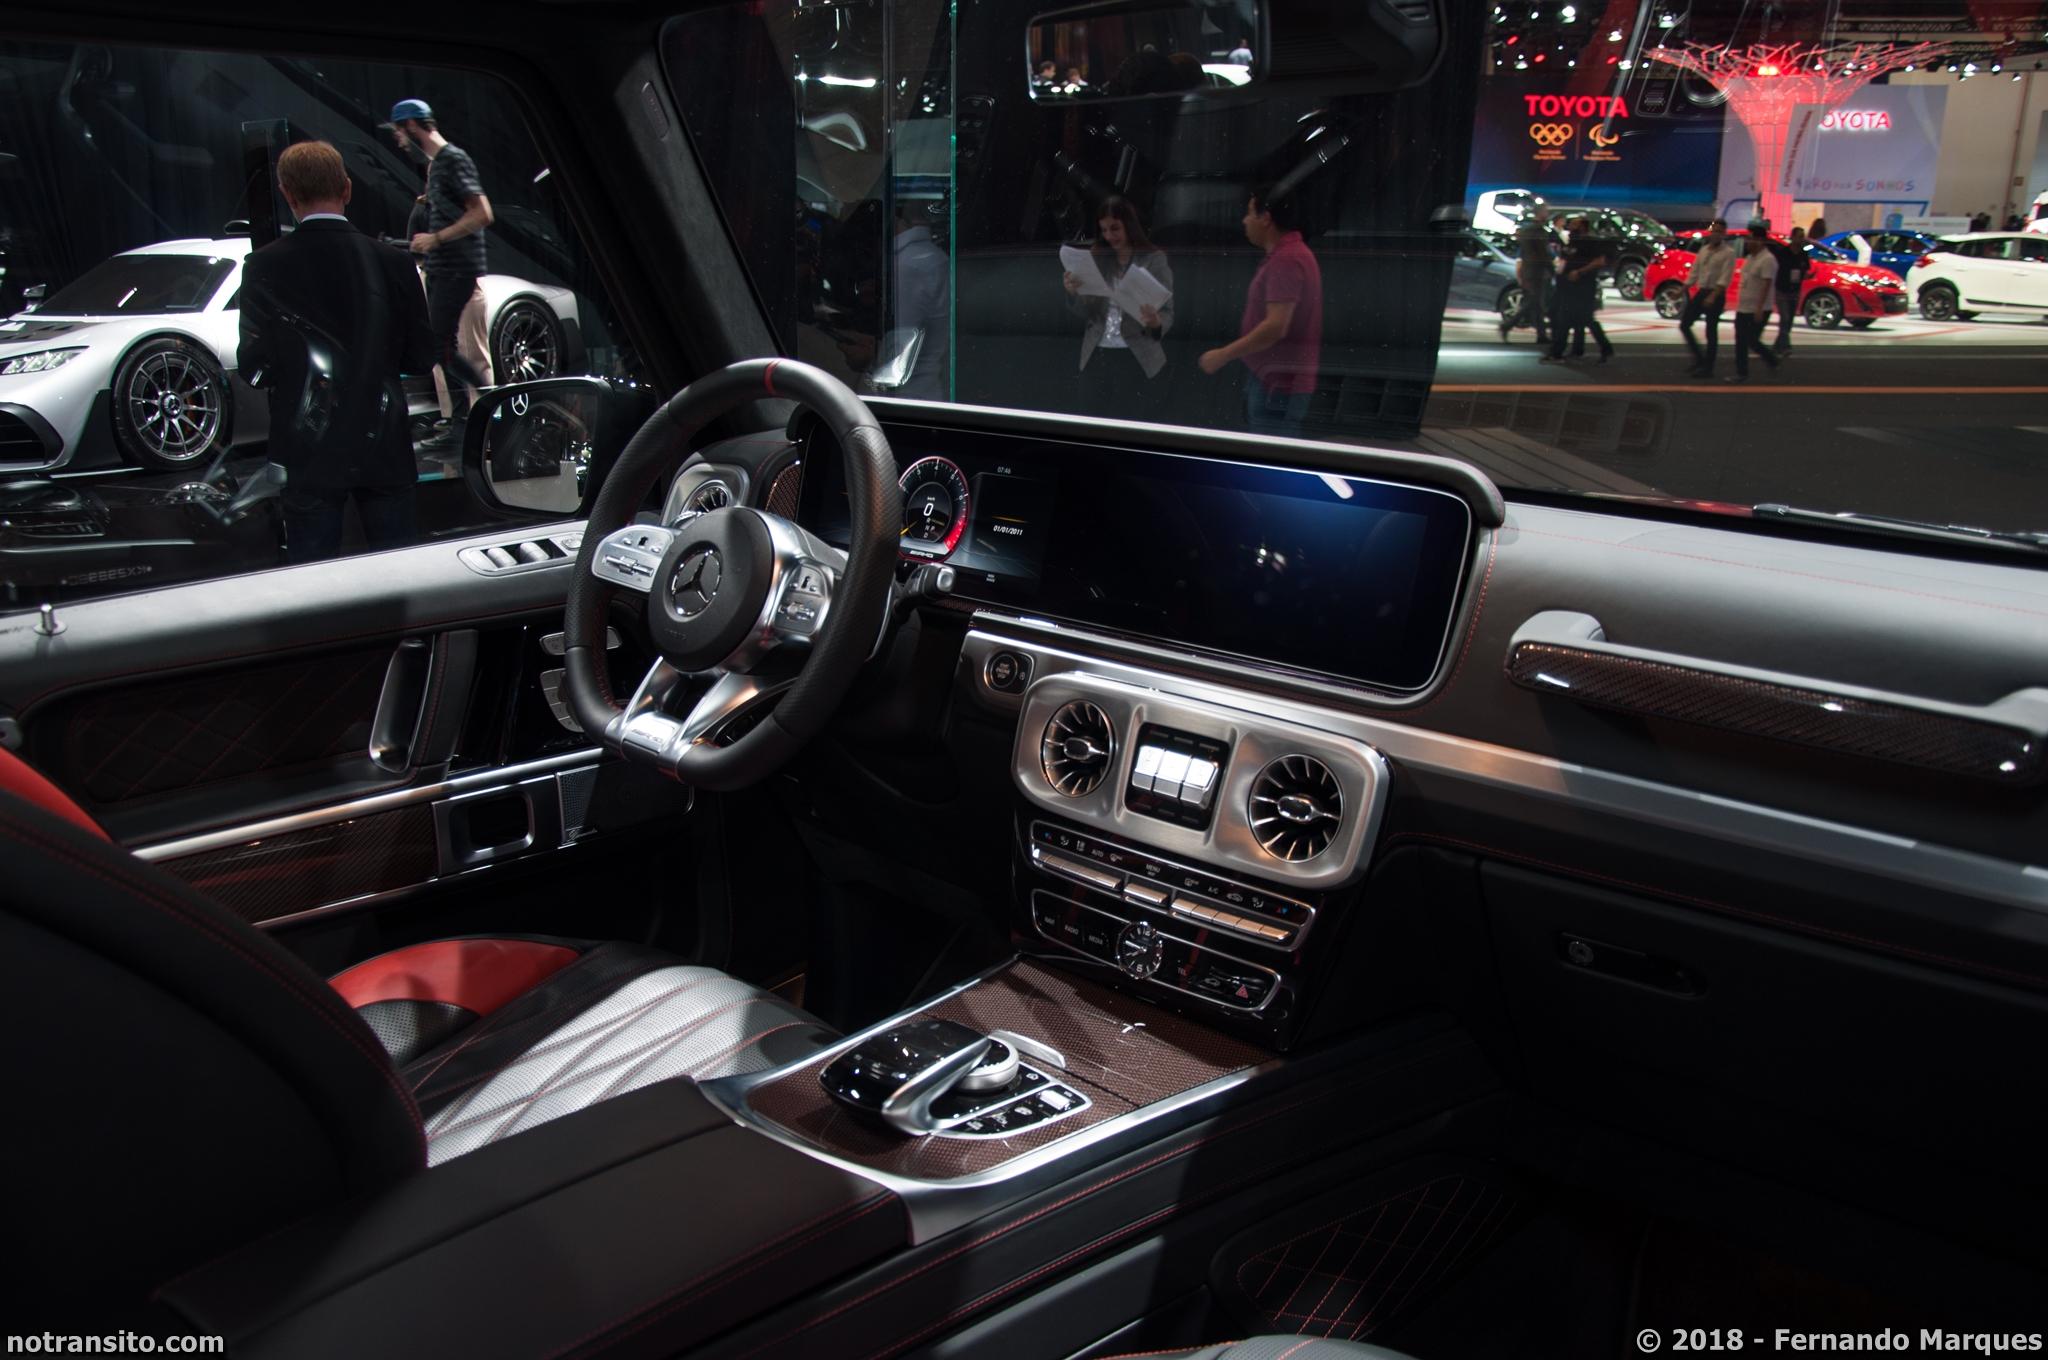 Salão2018-ConheçaoEstandedaMercedes-Benz- Parte1-09